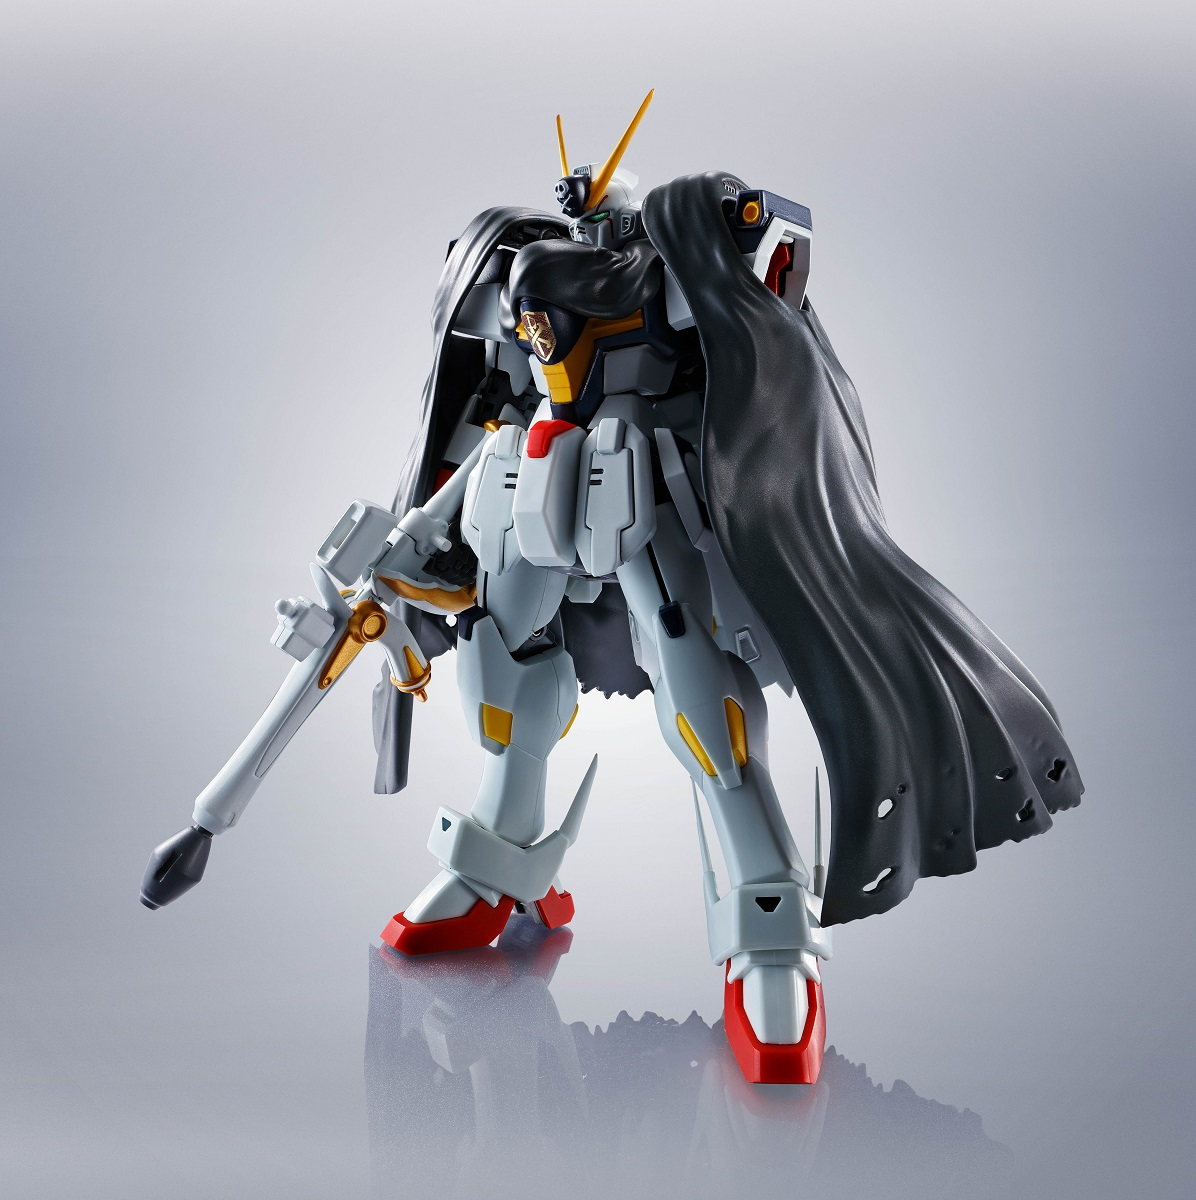 Crossbone Gundam X1/X1 Kai Evolution Spec Mobile Suit Crossbone Gundam Figure